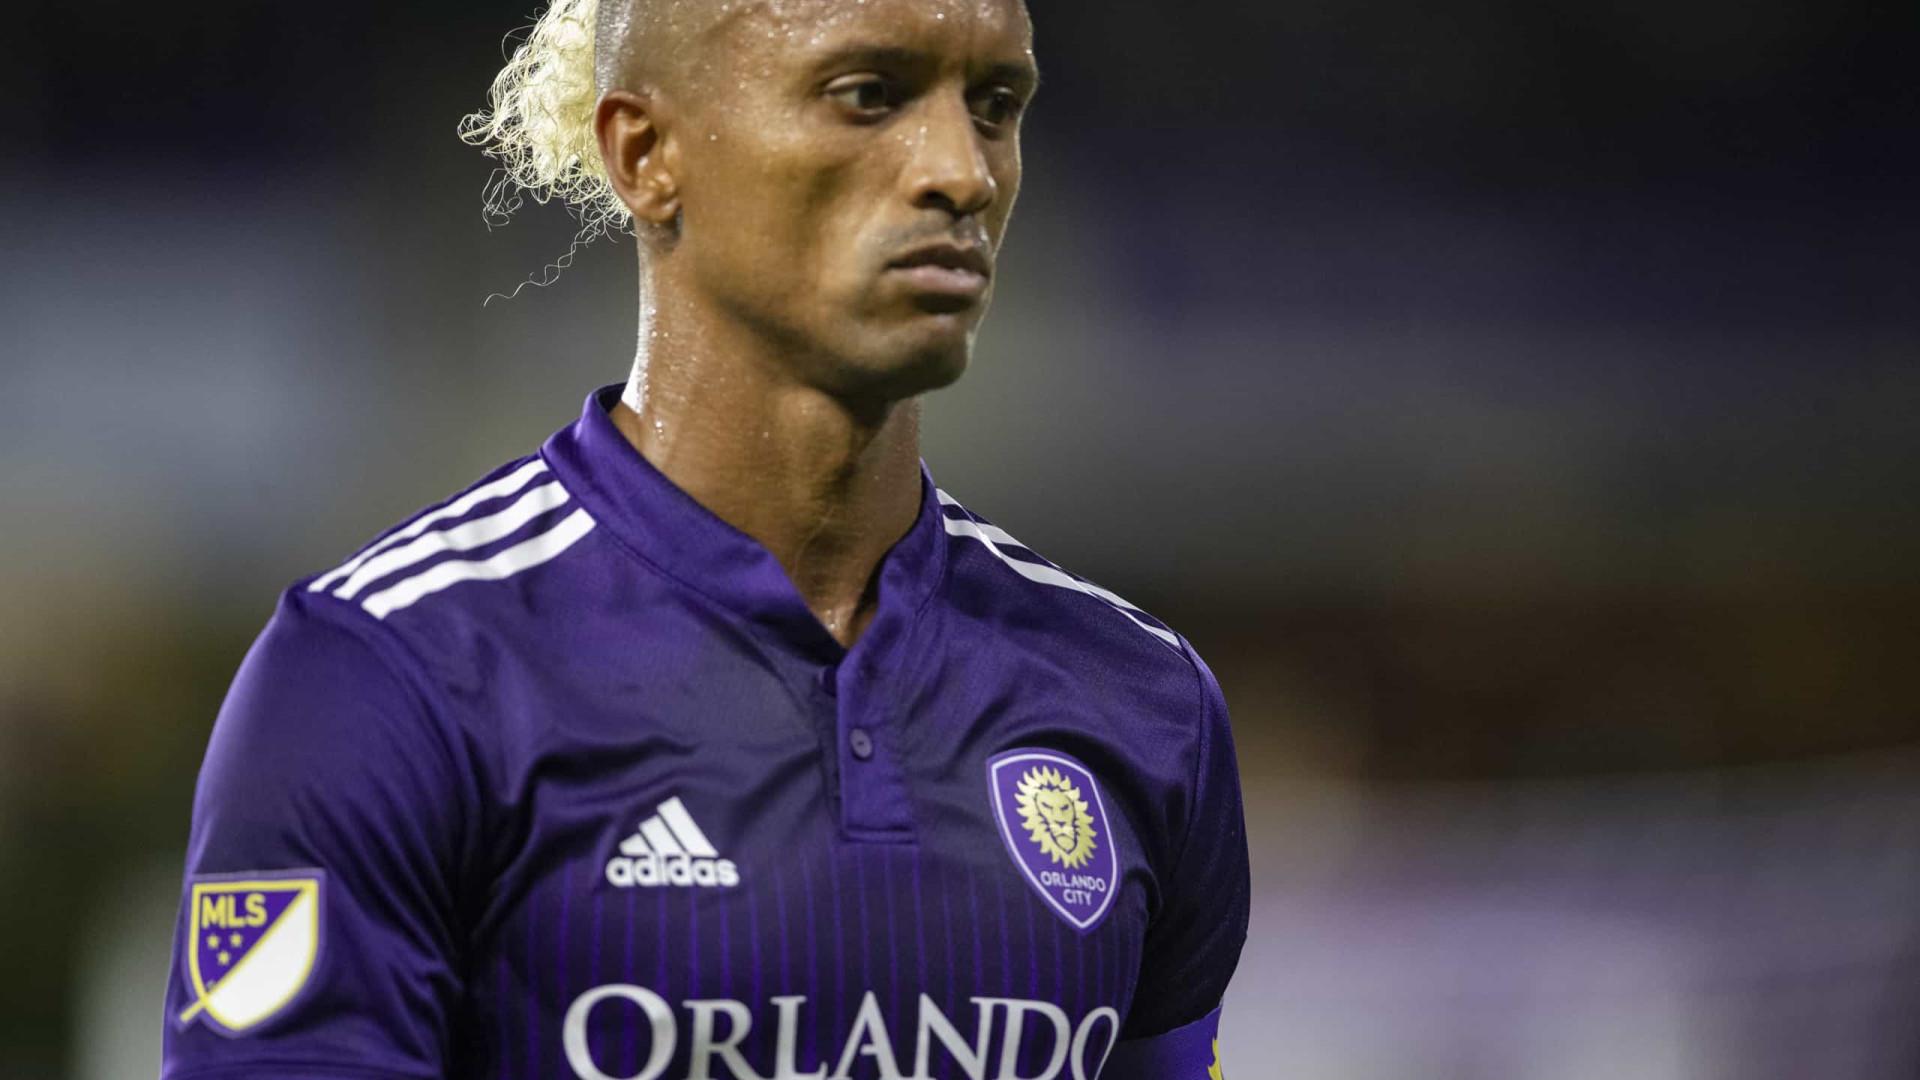 Pedro Santos bate Nani em confronto luso na MLS